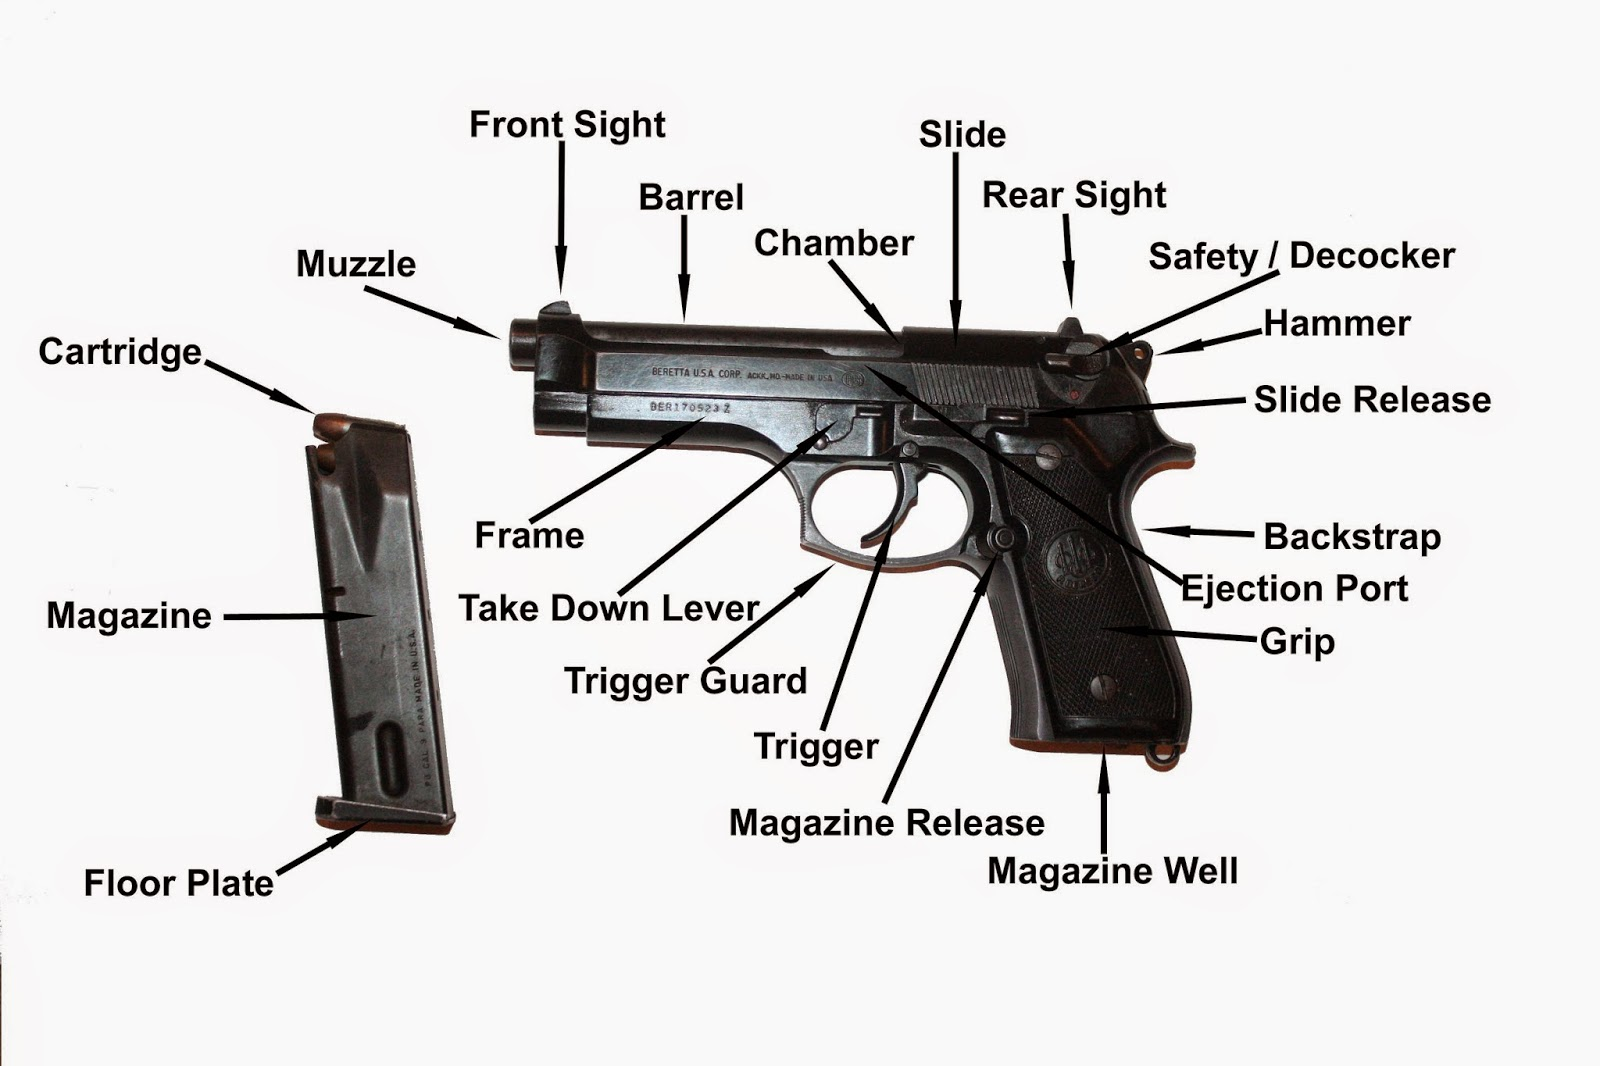 Righting Crime Fiction Semi Automatic Pistol Basics